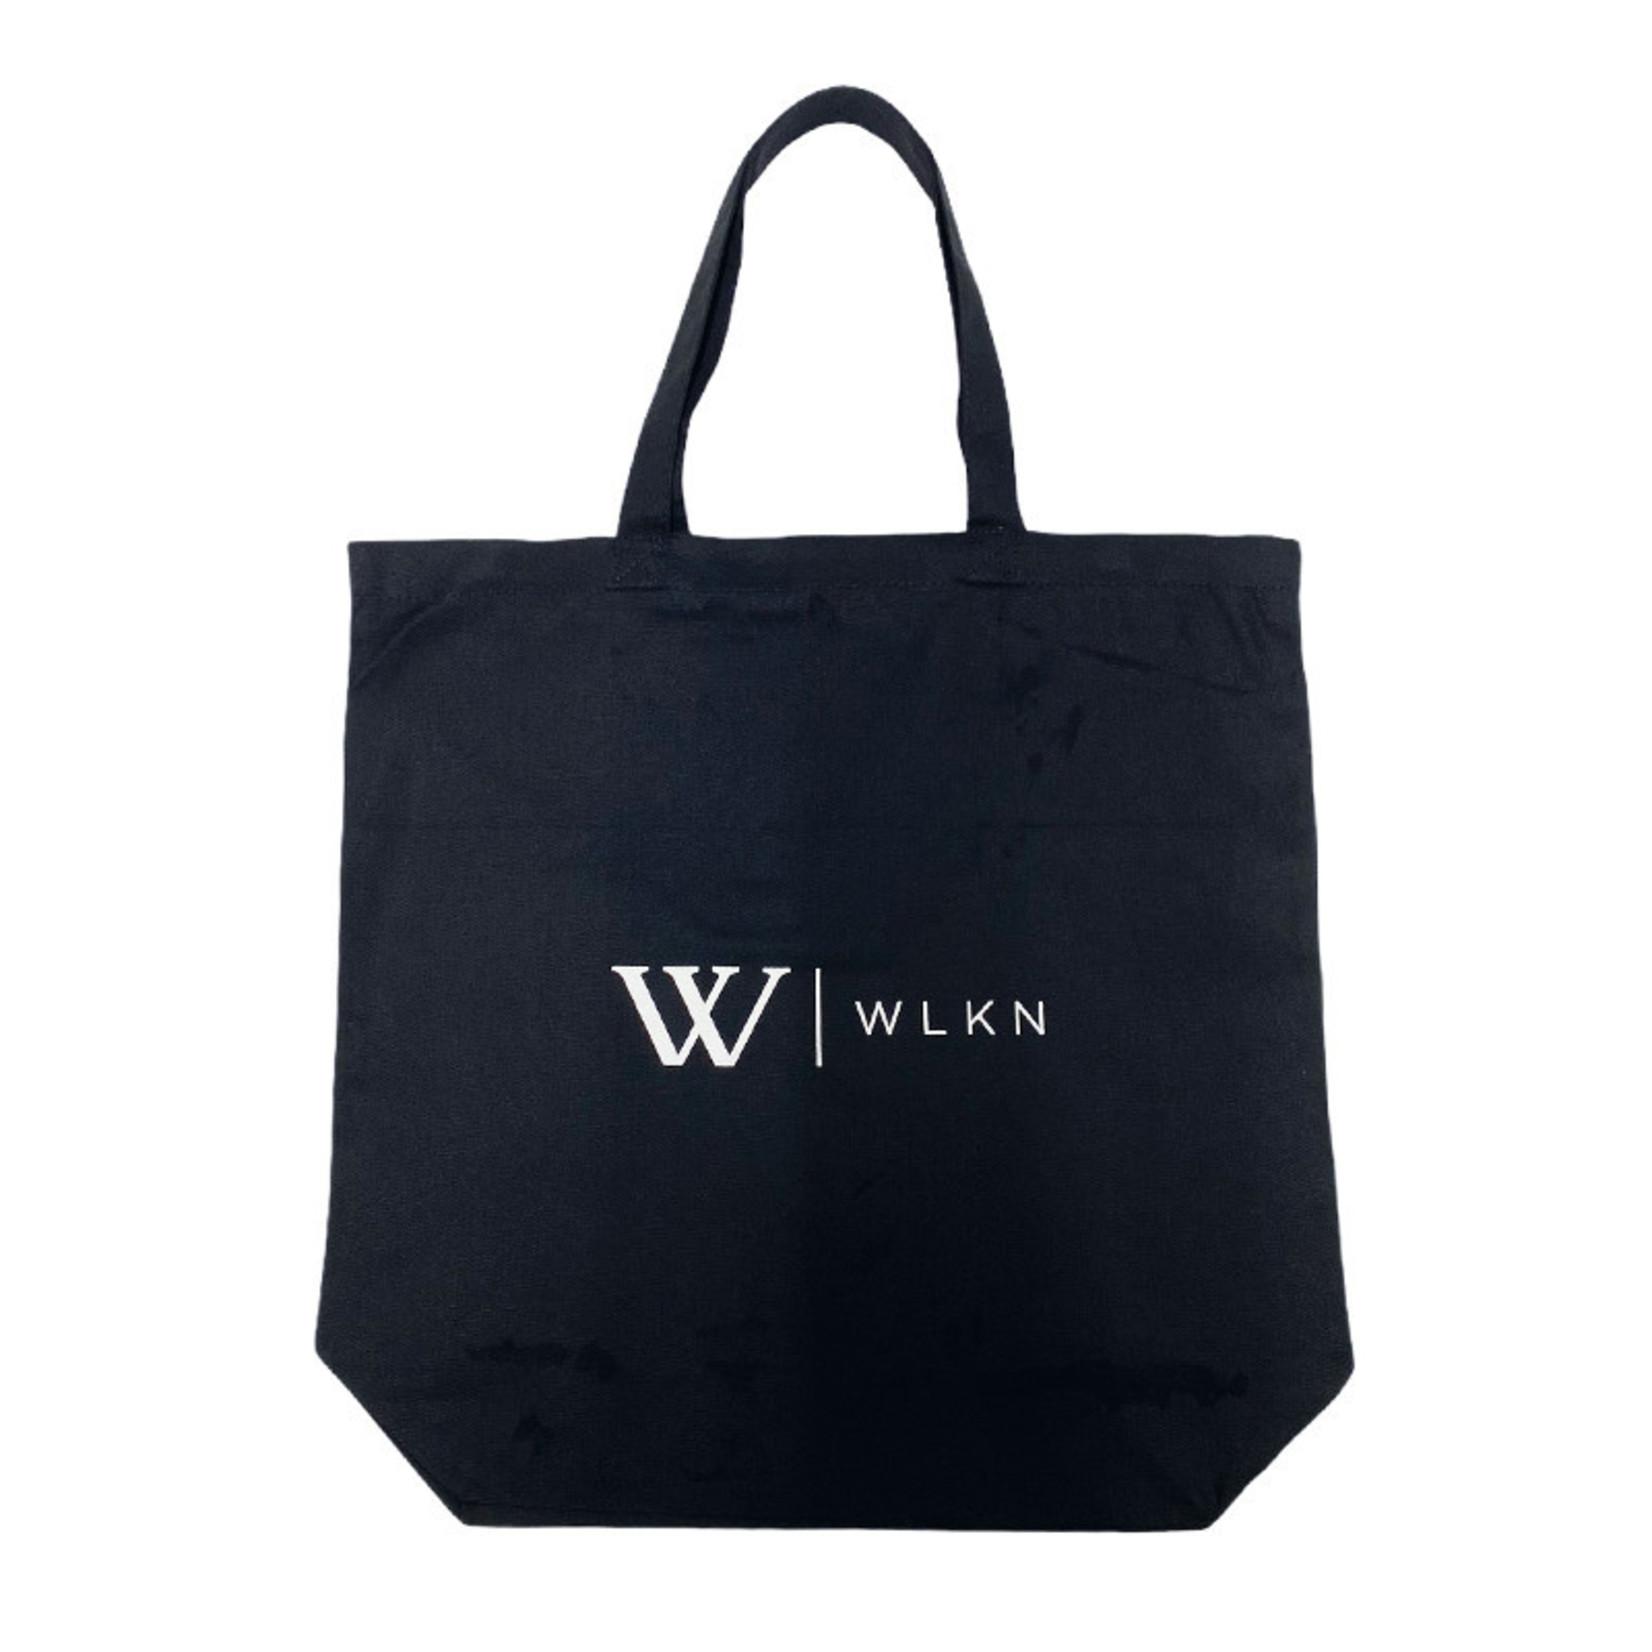 WLKN WLKN : Building Signature Tote Bag